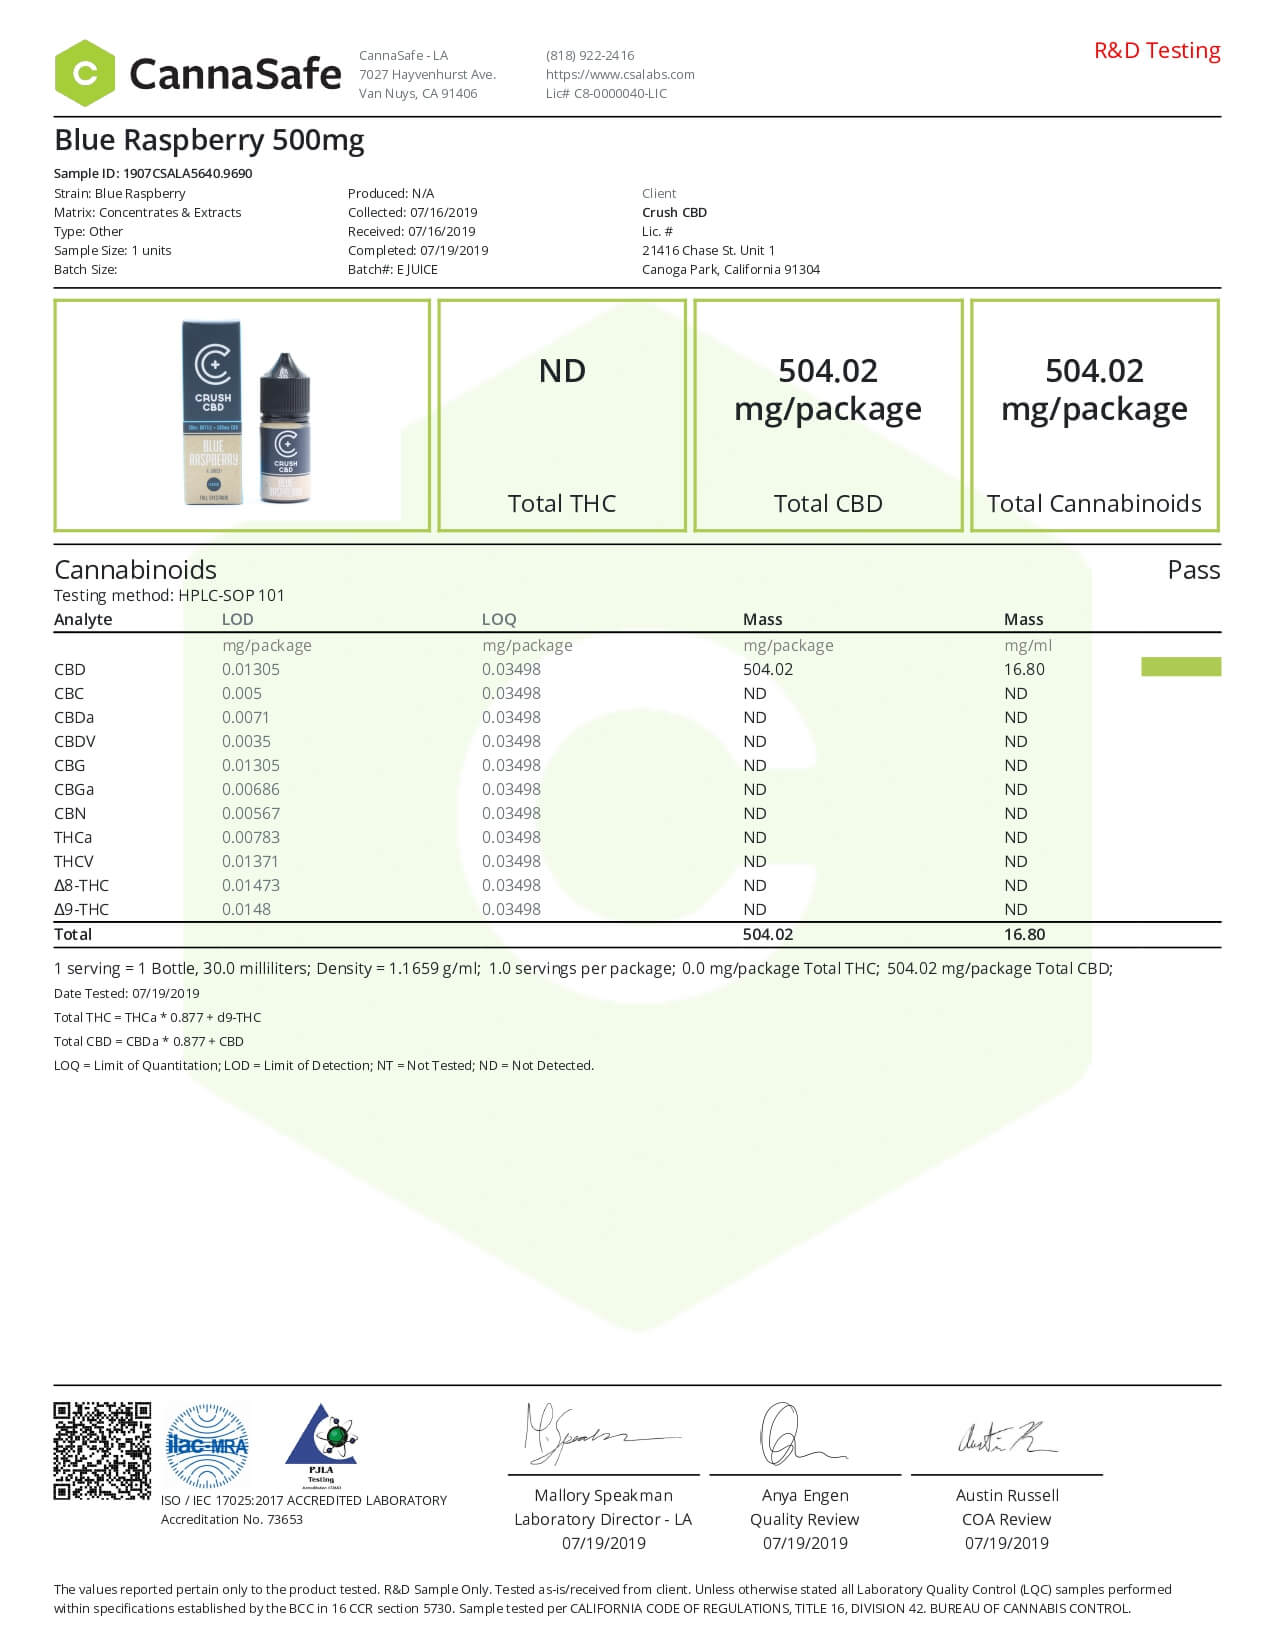 Crush CBD Vape Juice Blue Raspberry Lab Report